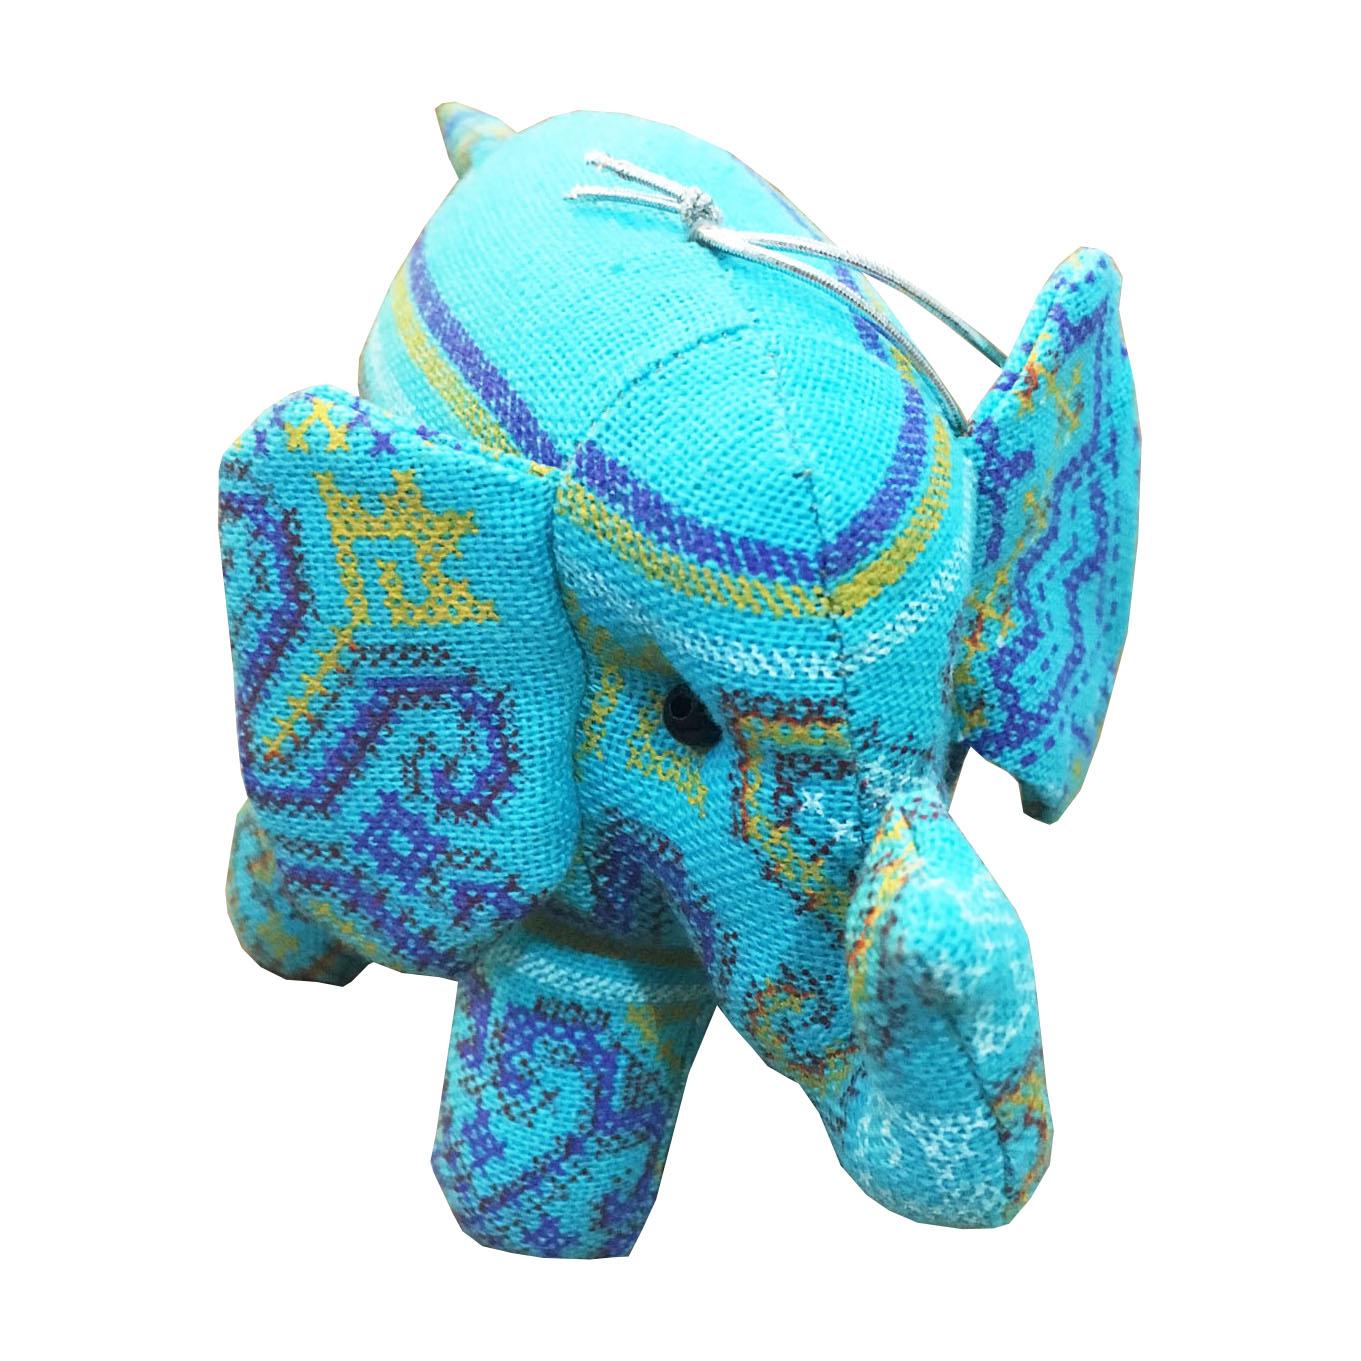 Thai Wedding Gifts: Handmade Blue Thai Cotton Elephant